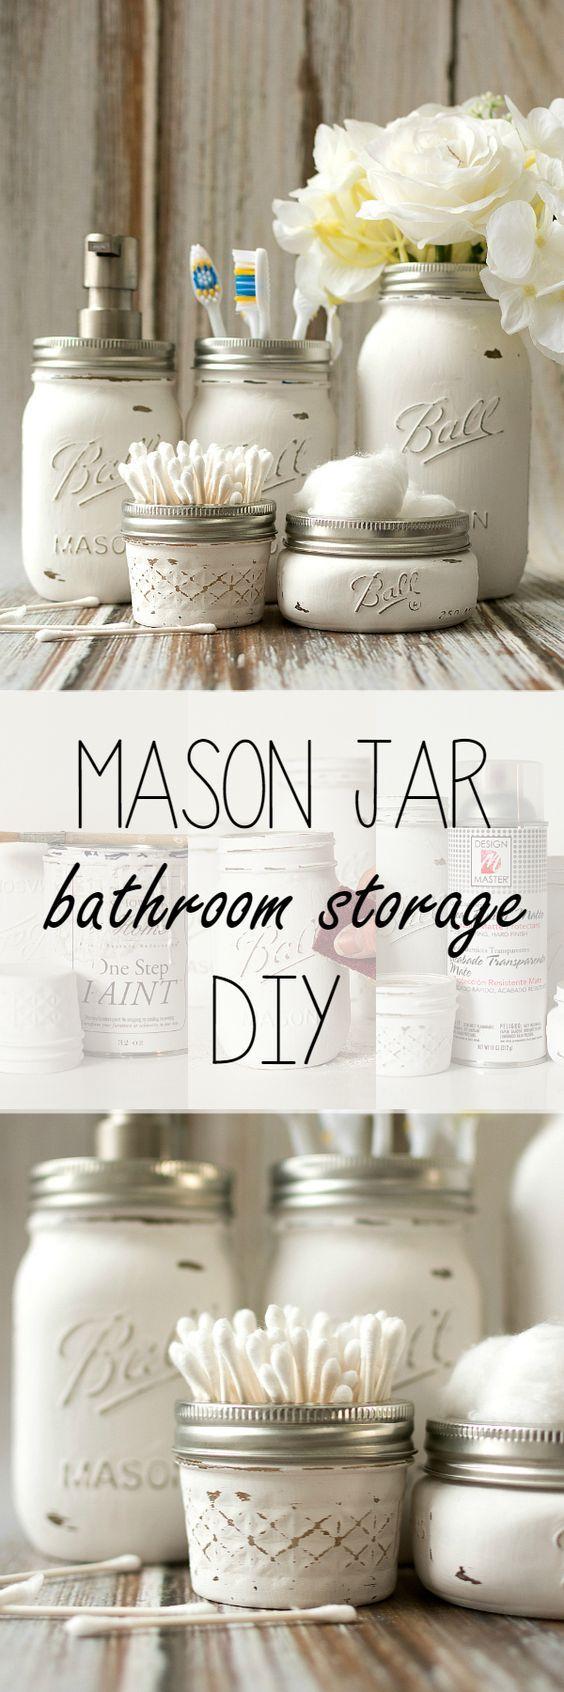 Mason Jar Bathroom Storage & Accessories | via